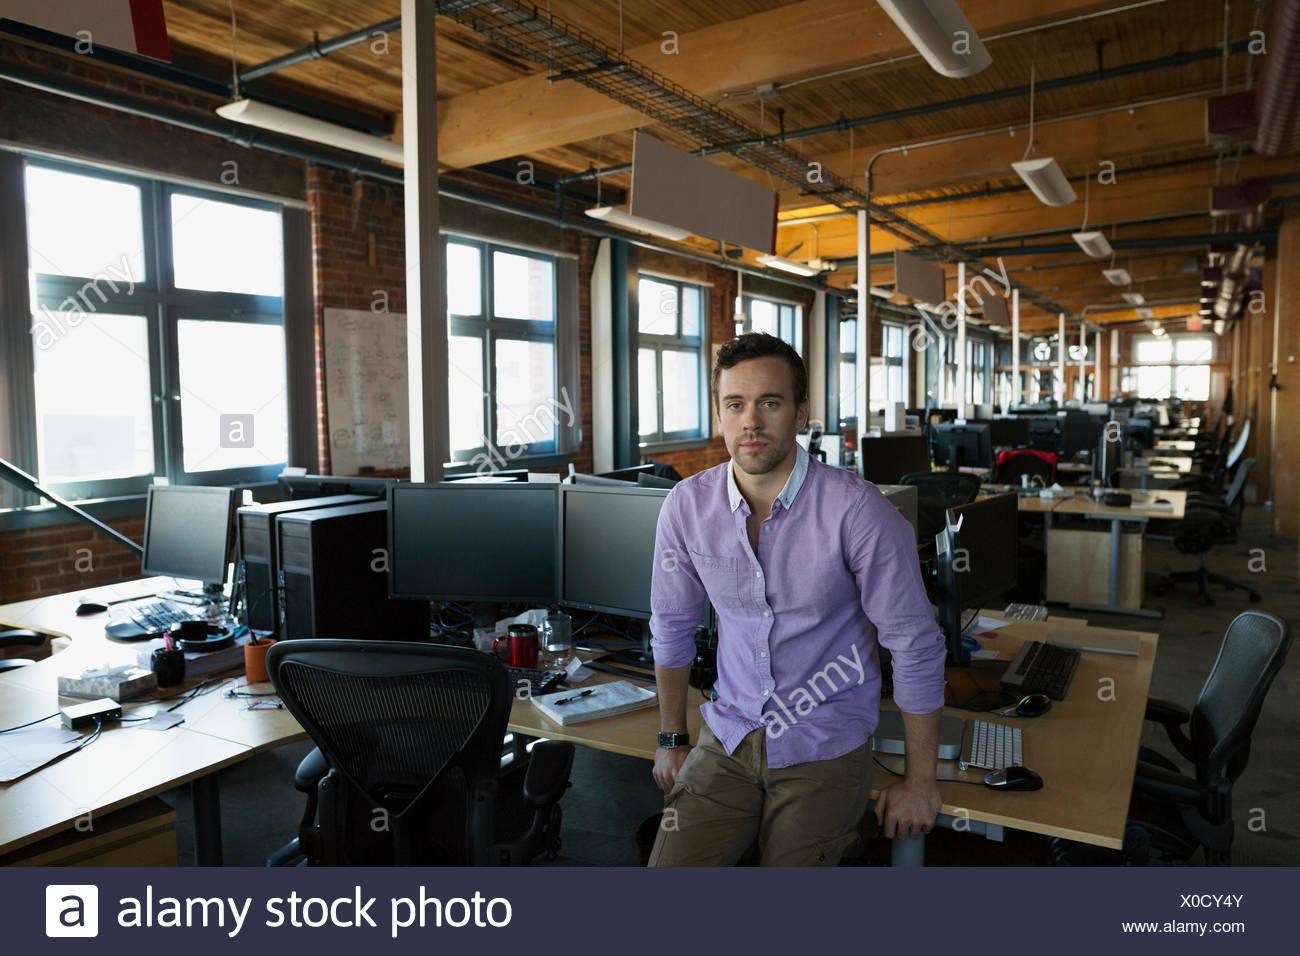 Retrato empresario serio en open office Imagen De Stock